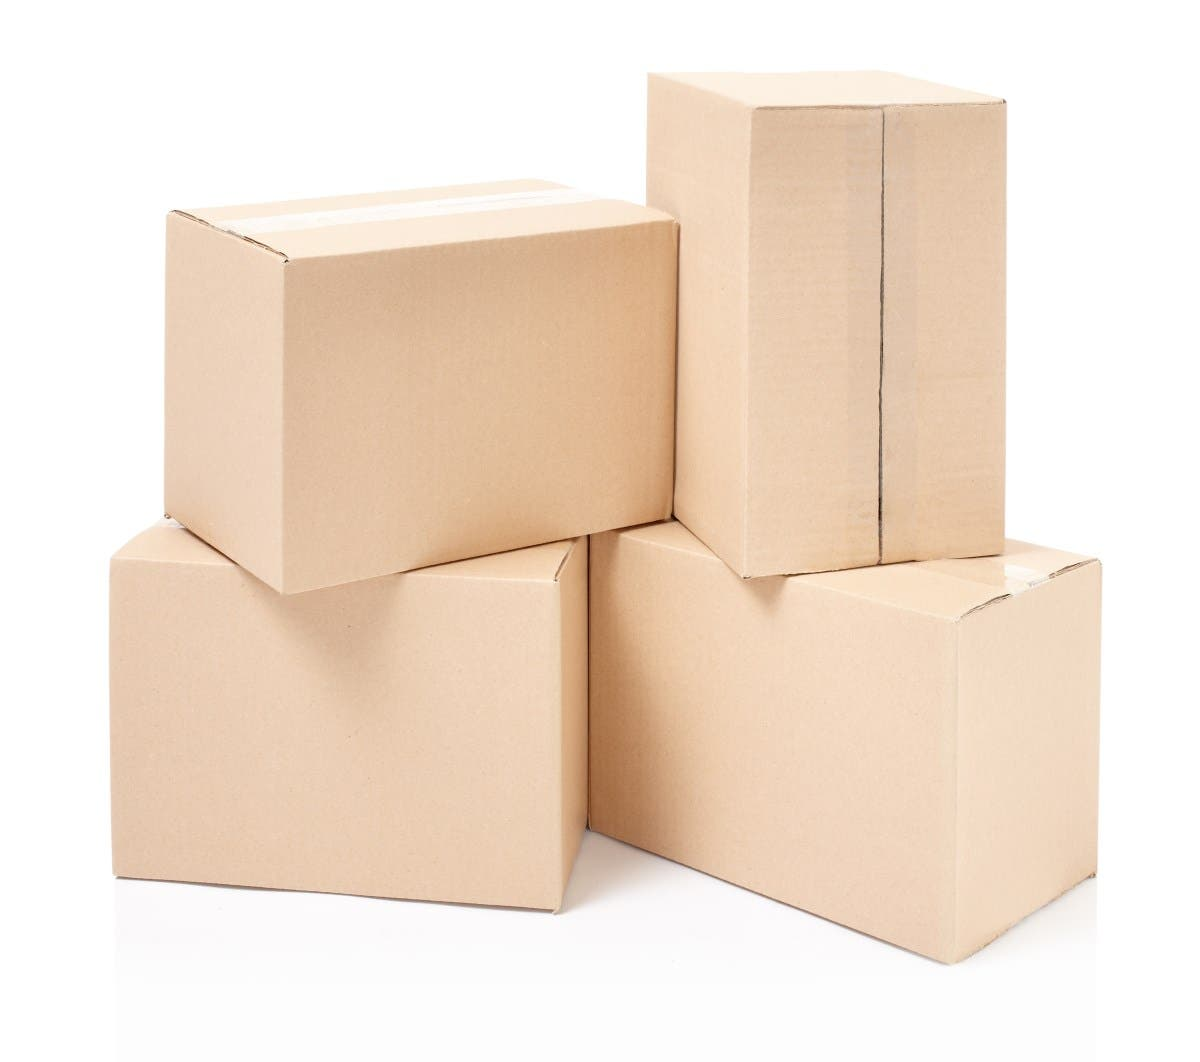 metodo-4-caixas